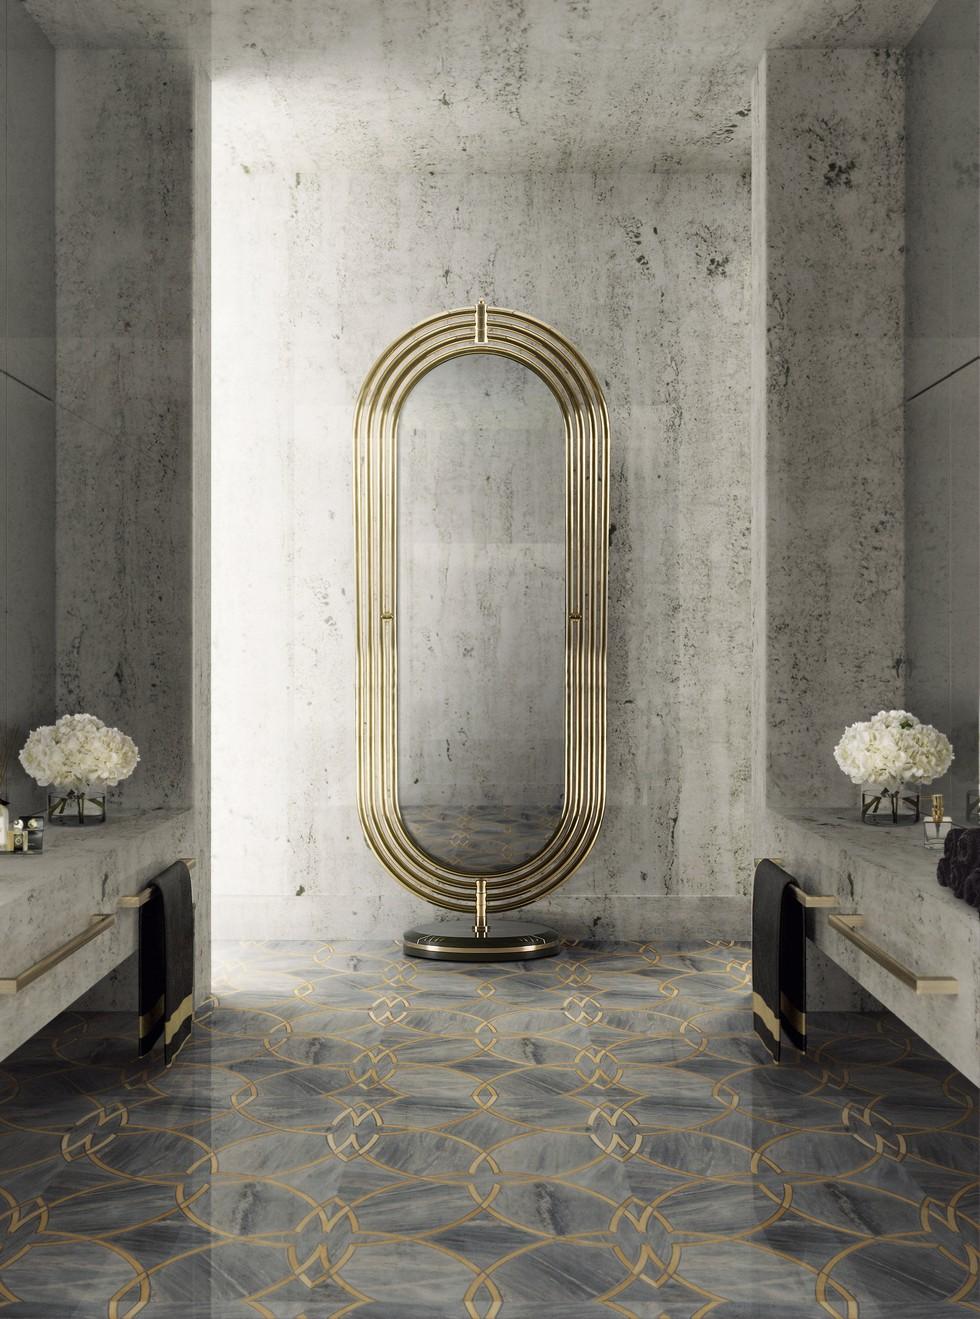 COLOSSEUM: THE ROTATING FLOOR MIRROR 22 colosseum floor mirror maison valentina HR